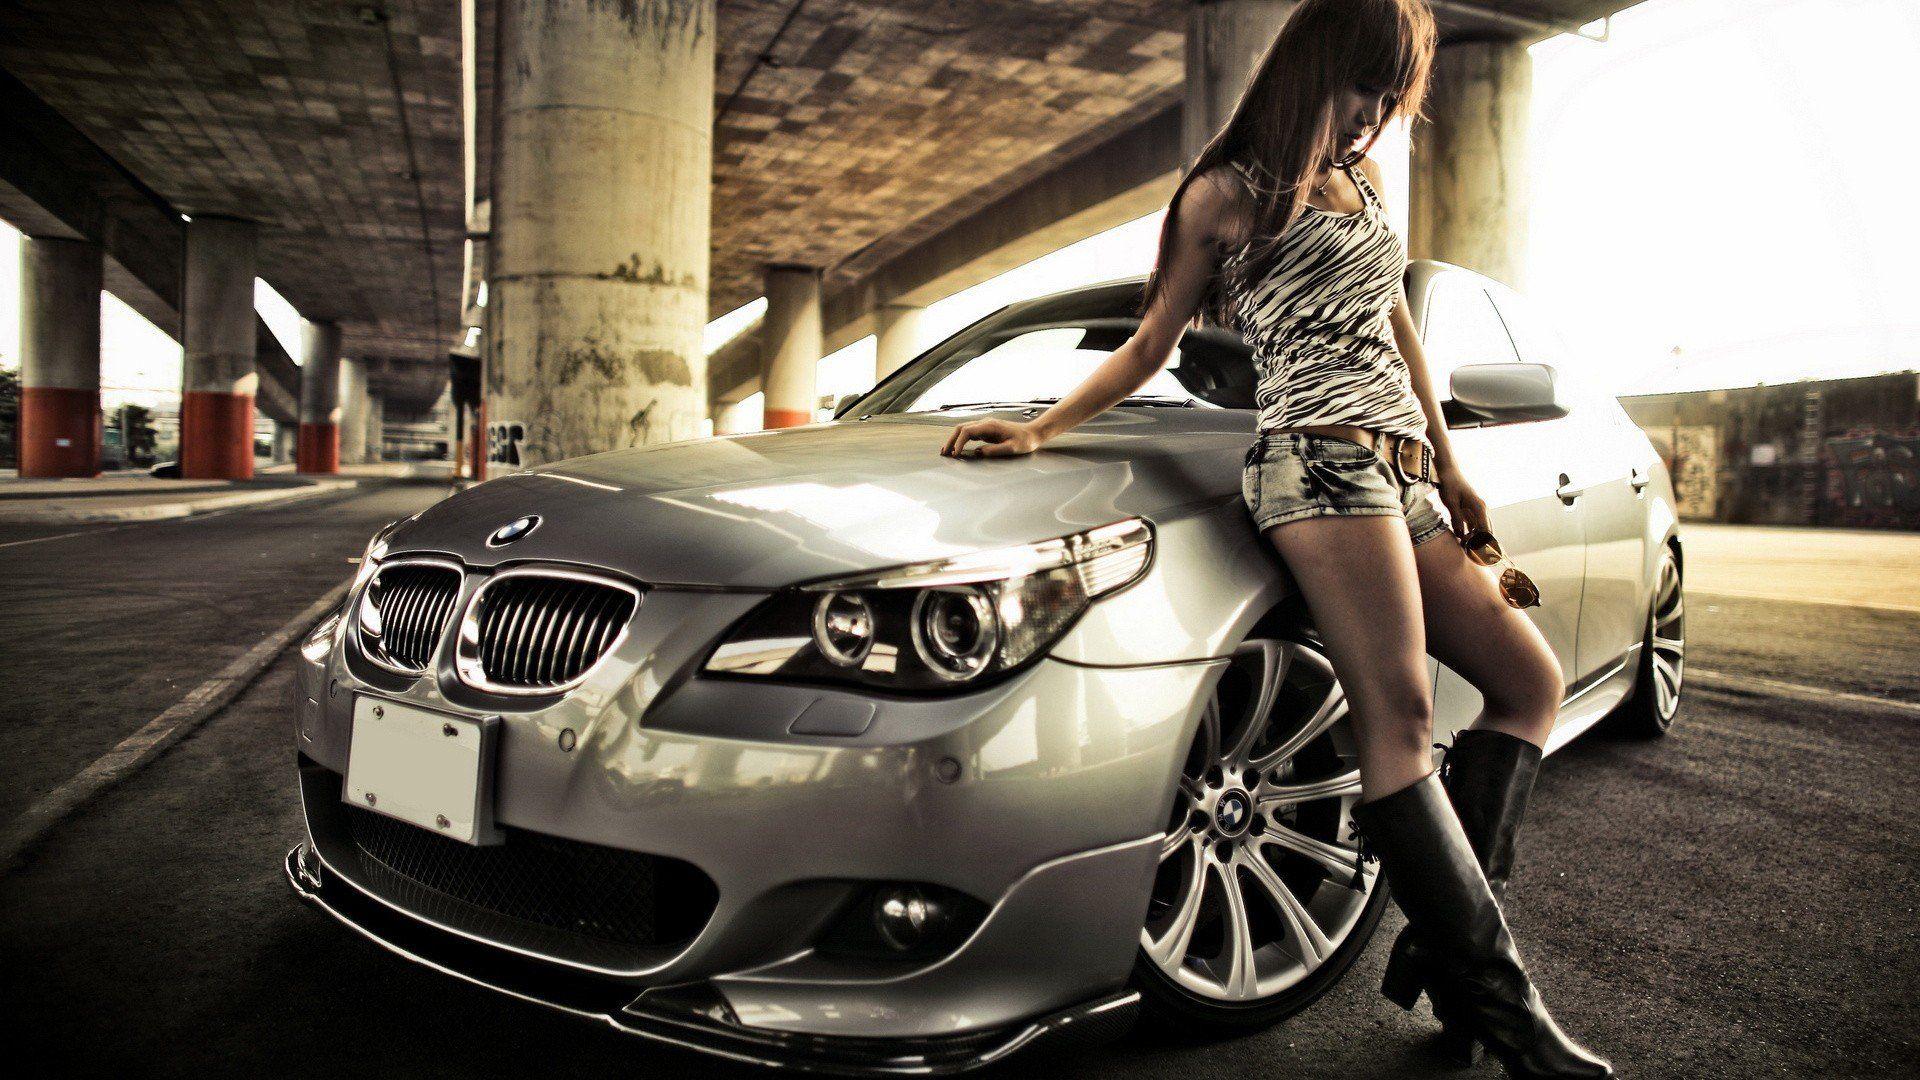 Bmw M Gts Car Wallpaper Hd Free Download For Desktop